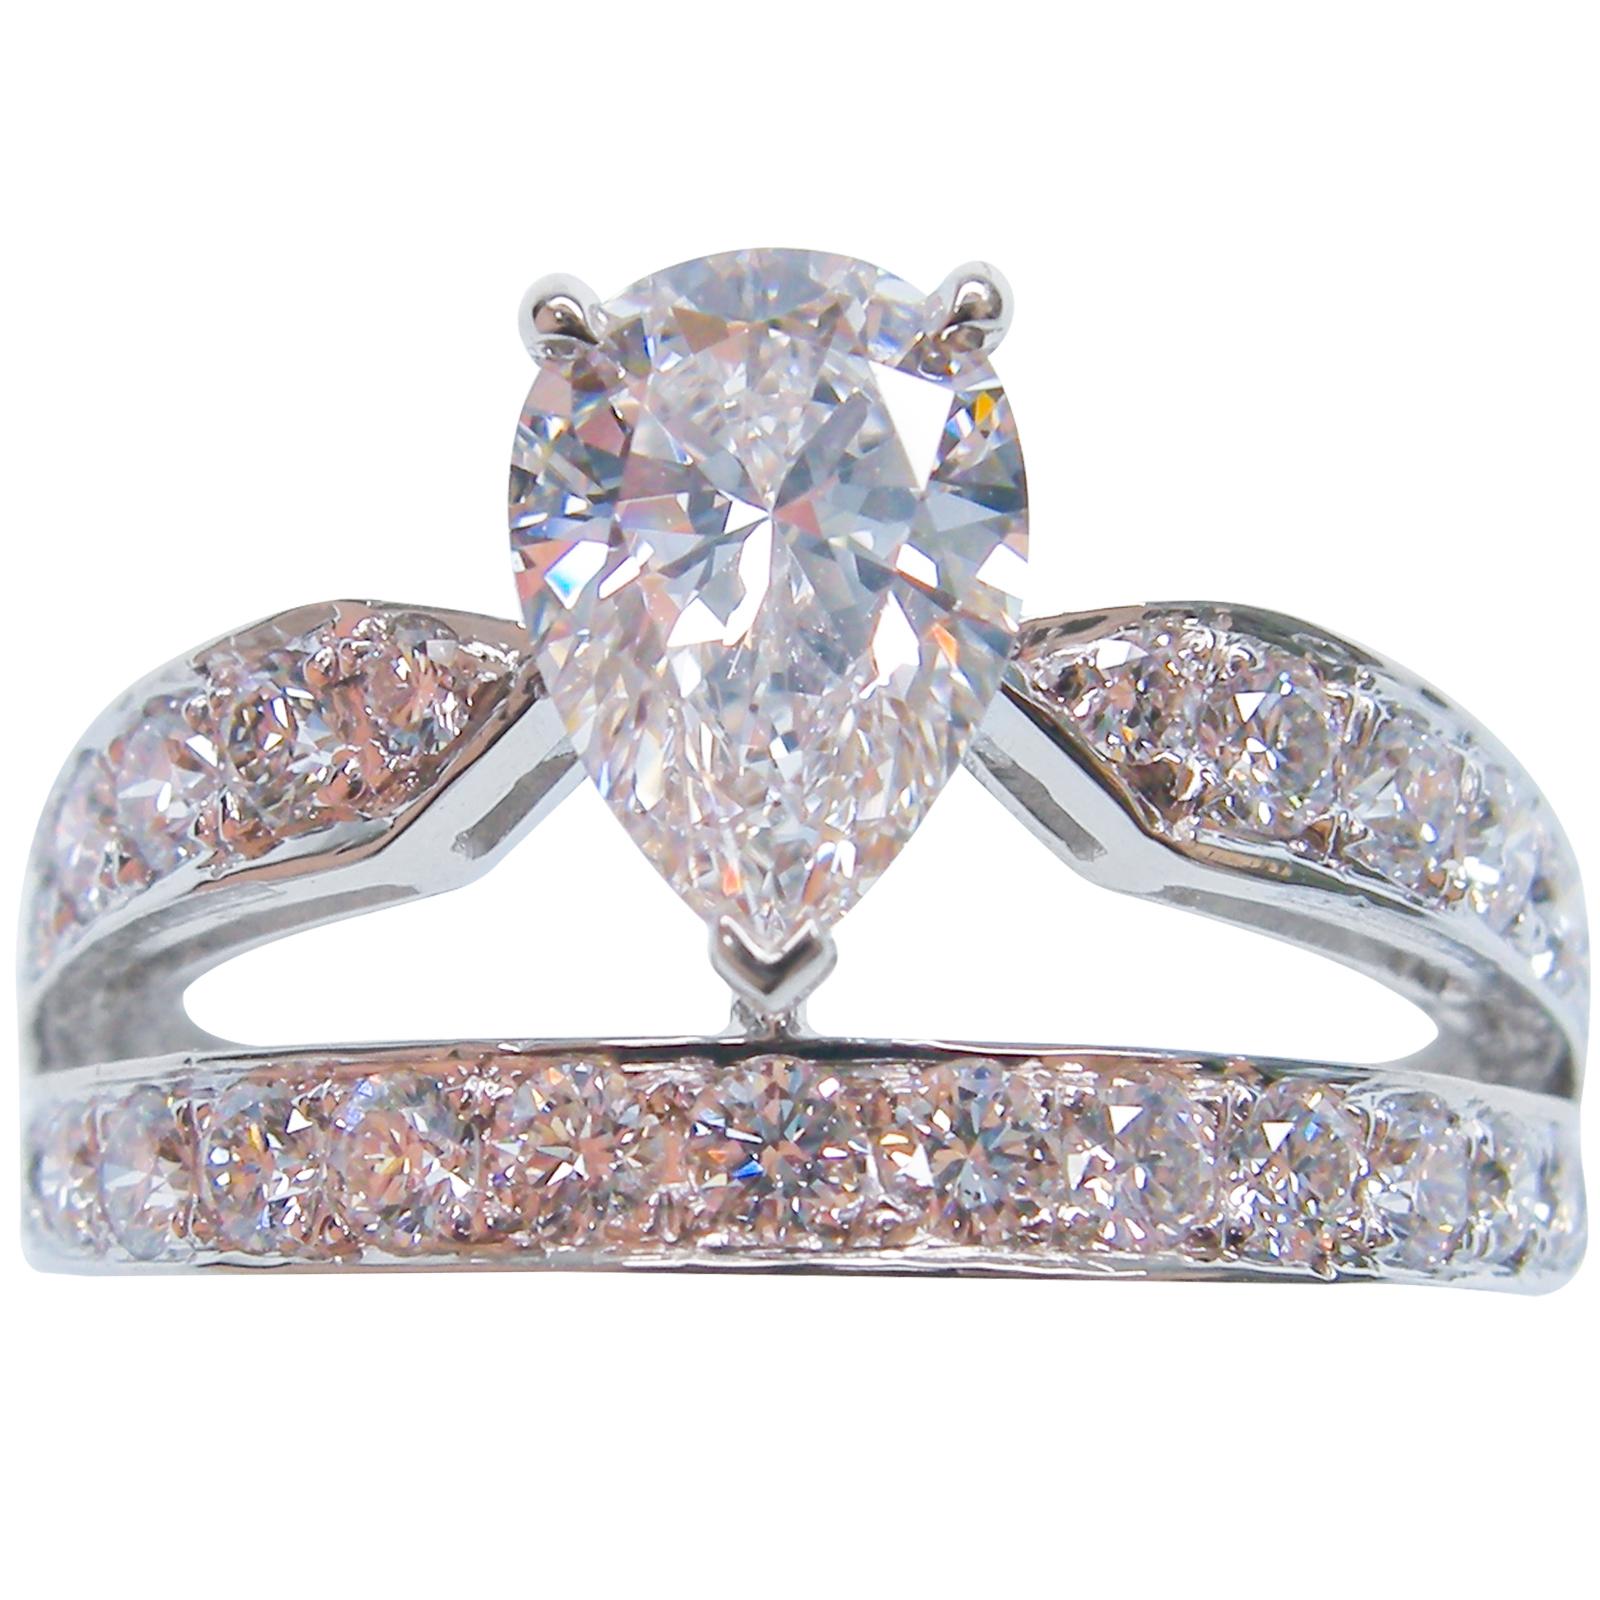 PEAR CUT DIAMOND DOUBLE BAND TIARA RING BESPOKE FINE JEWELLERY BY SHAHINA HATTA